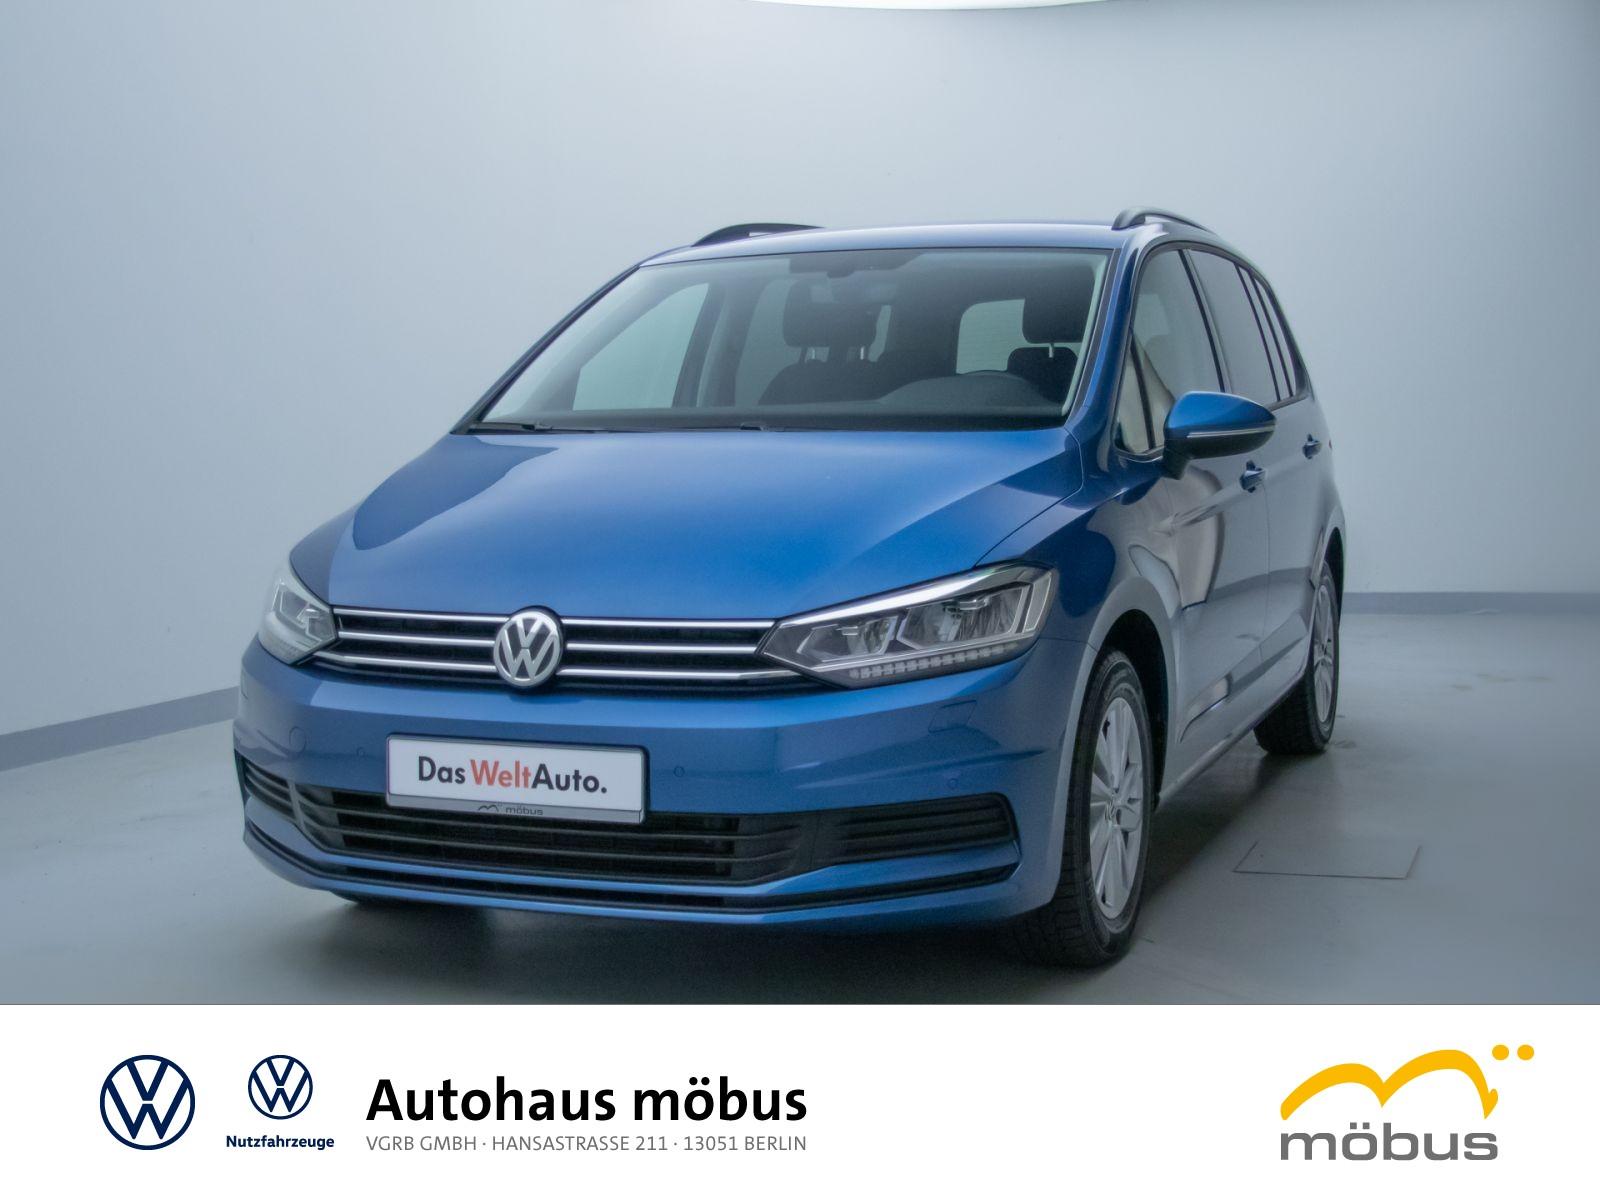 Volkswagen Touran 1.5 TSI DSG*COMFORTL*LED*ACC*7SITZER*RFK*, Jahr 2020, Benzin